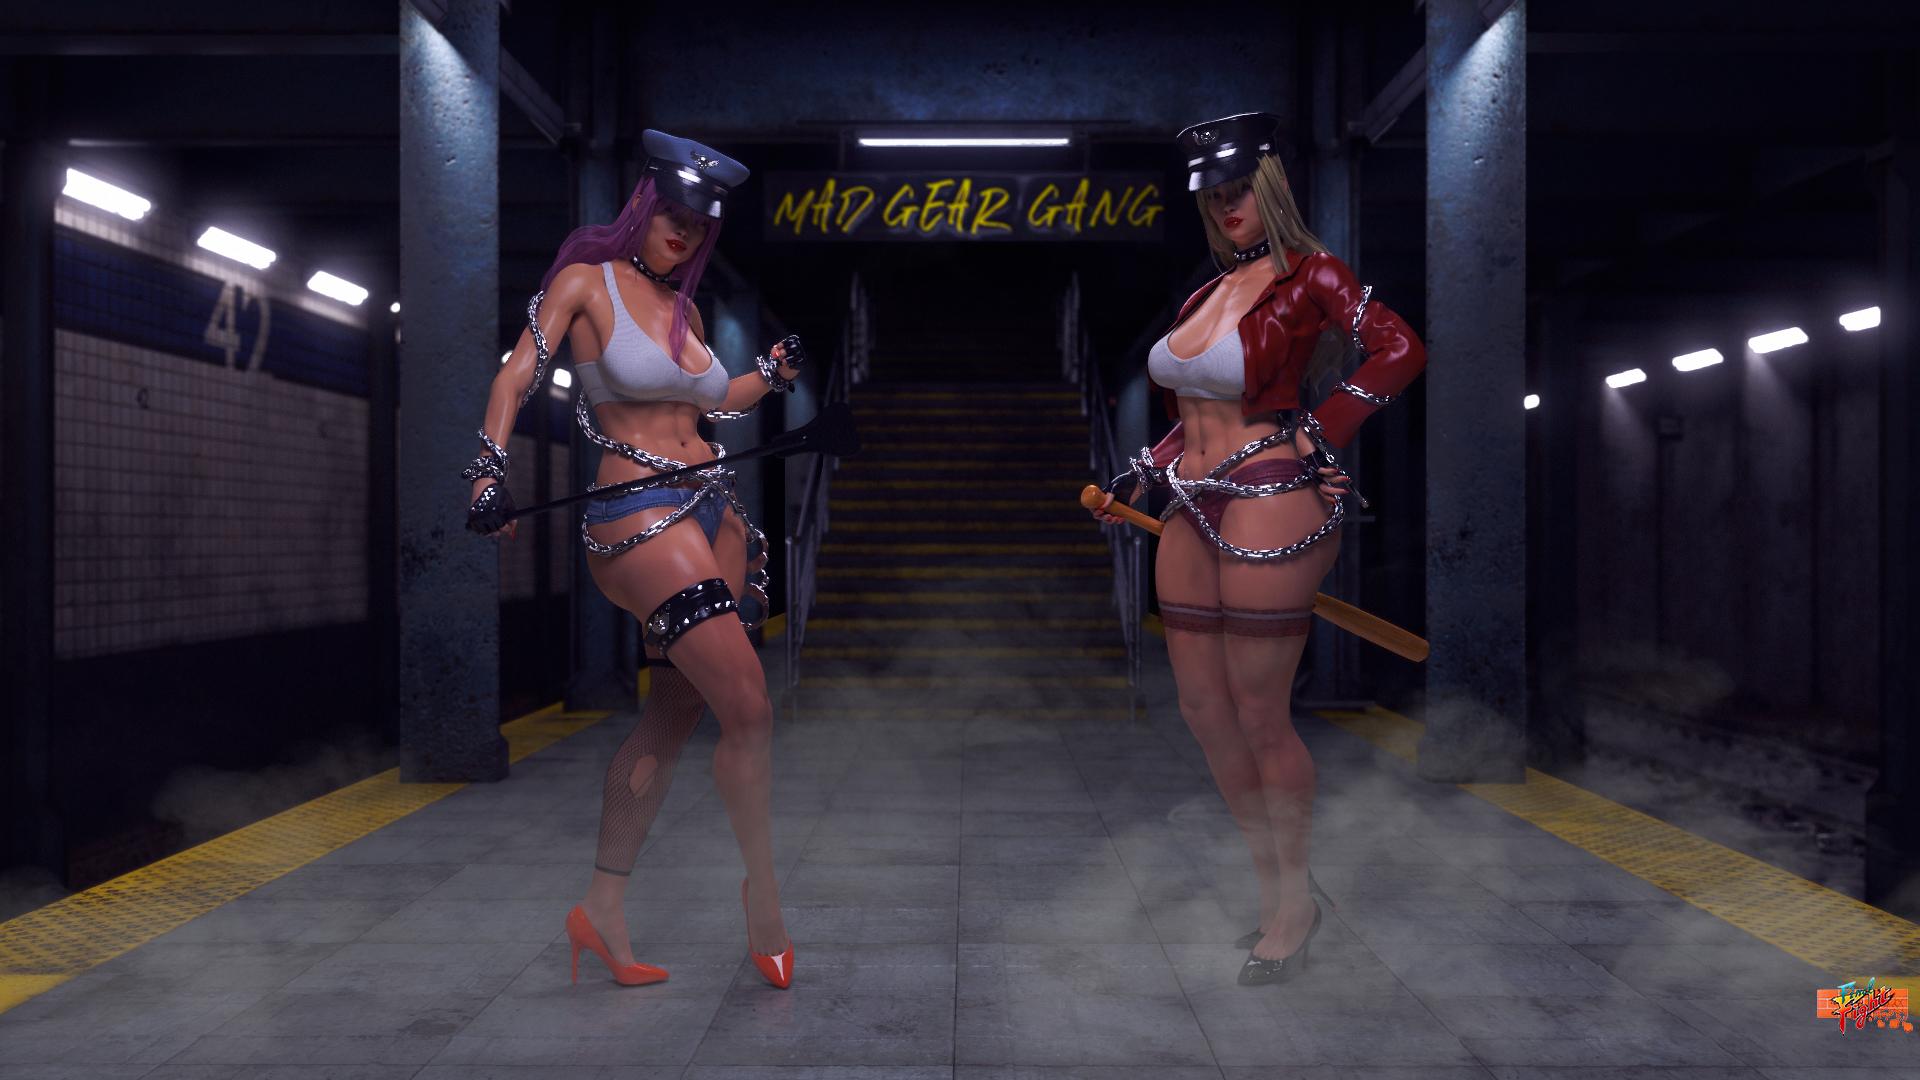 General 1920x1080 women digital art artwork cyberpunk model high heels video games Street Fighter final fight Poison (Street Fighter) Roxy depth of field CGI redhead purple hair big boobs chains whips baseball bat leather punk